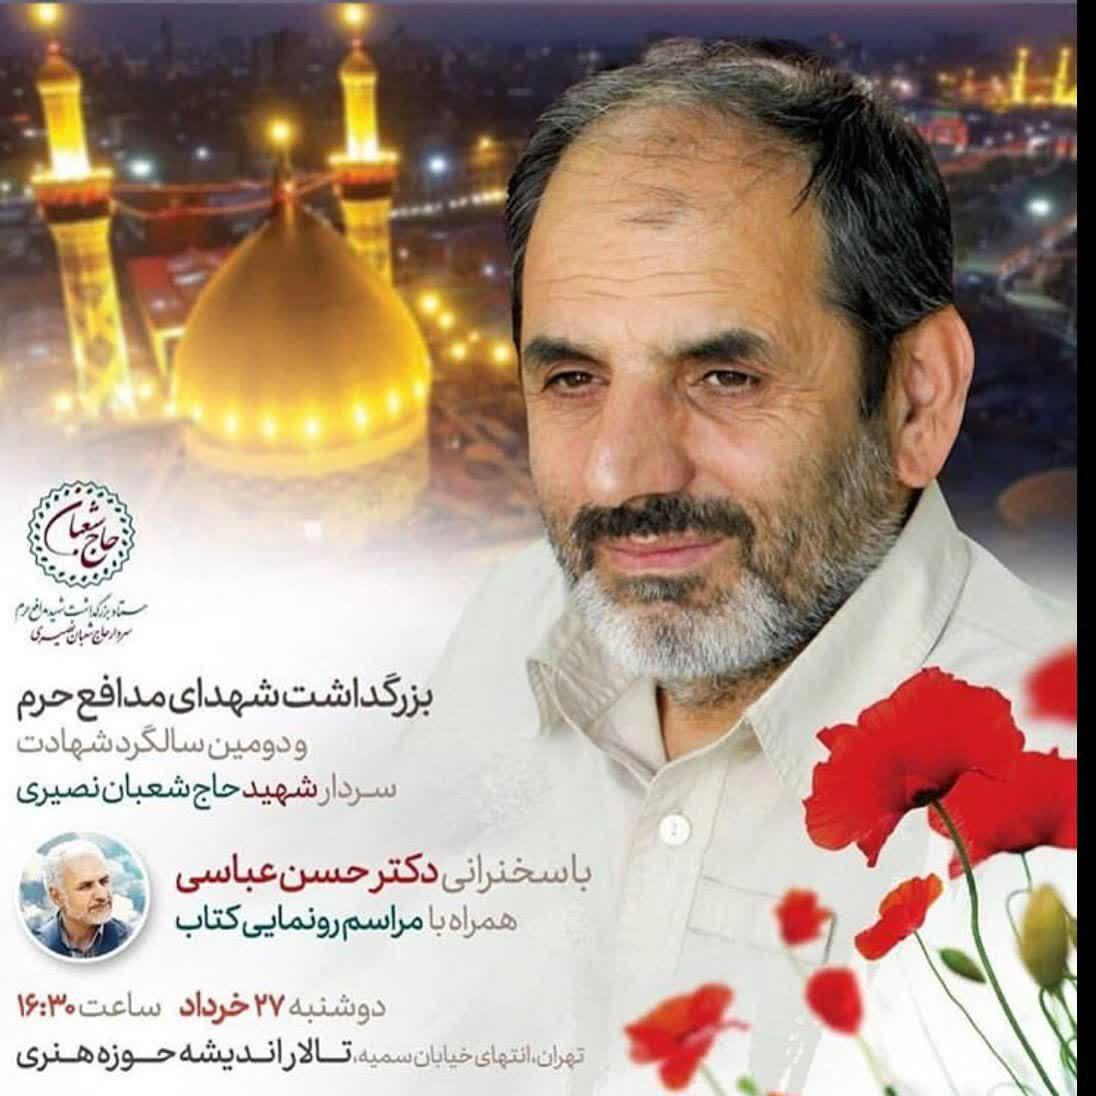 photo 2019 06 17 11 16 22 ۲۷ خرداد ۹۸؛ سخنرانی استاد حسن عباسی در حوزه هنری